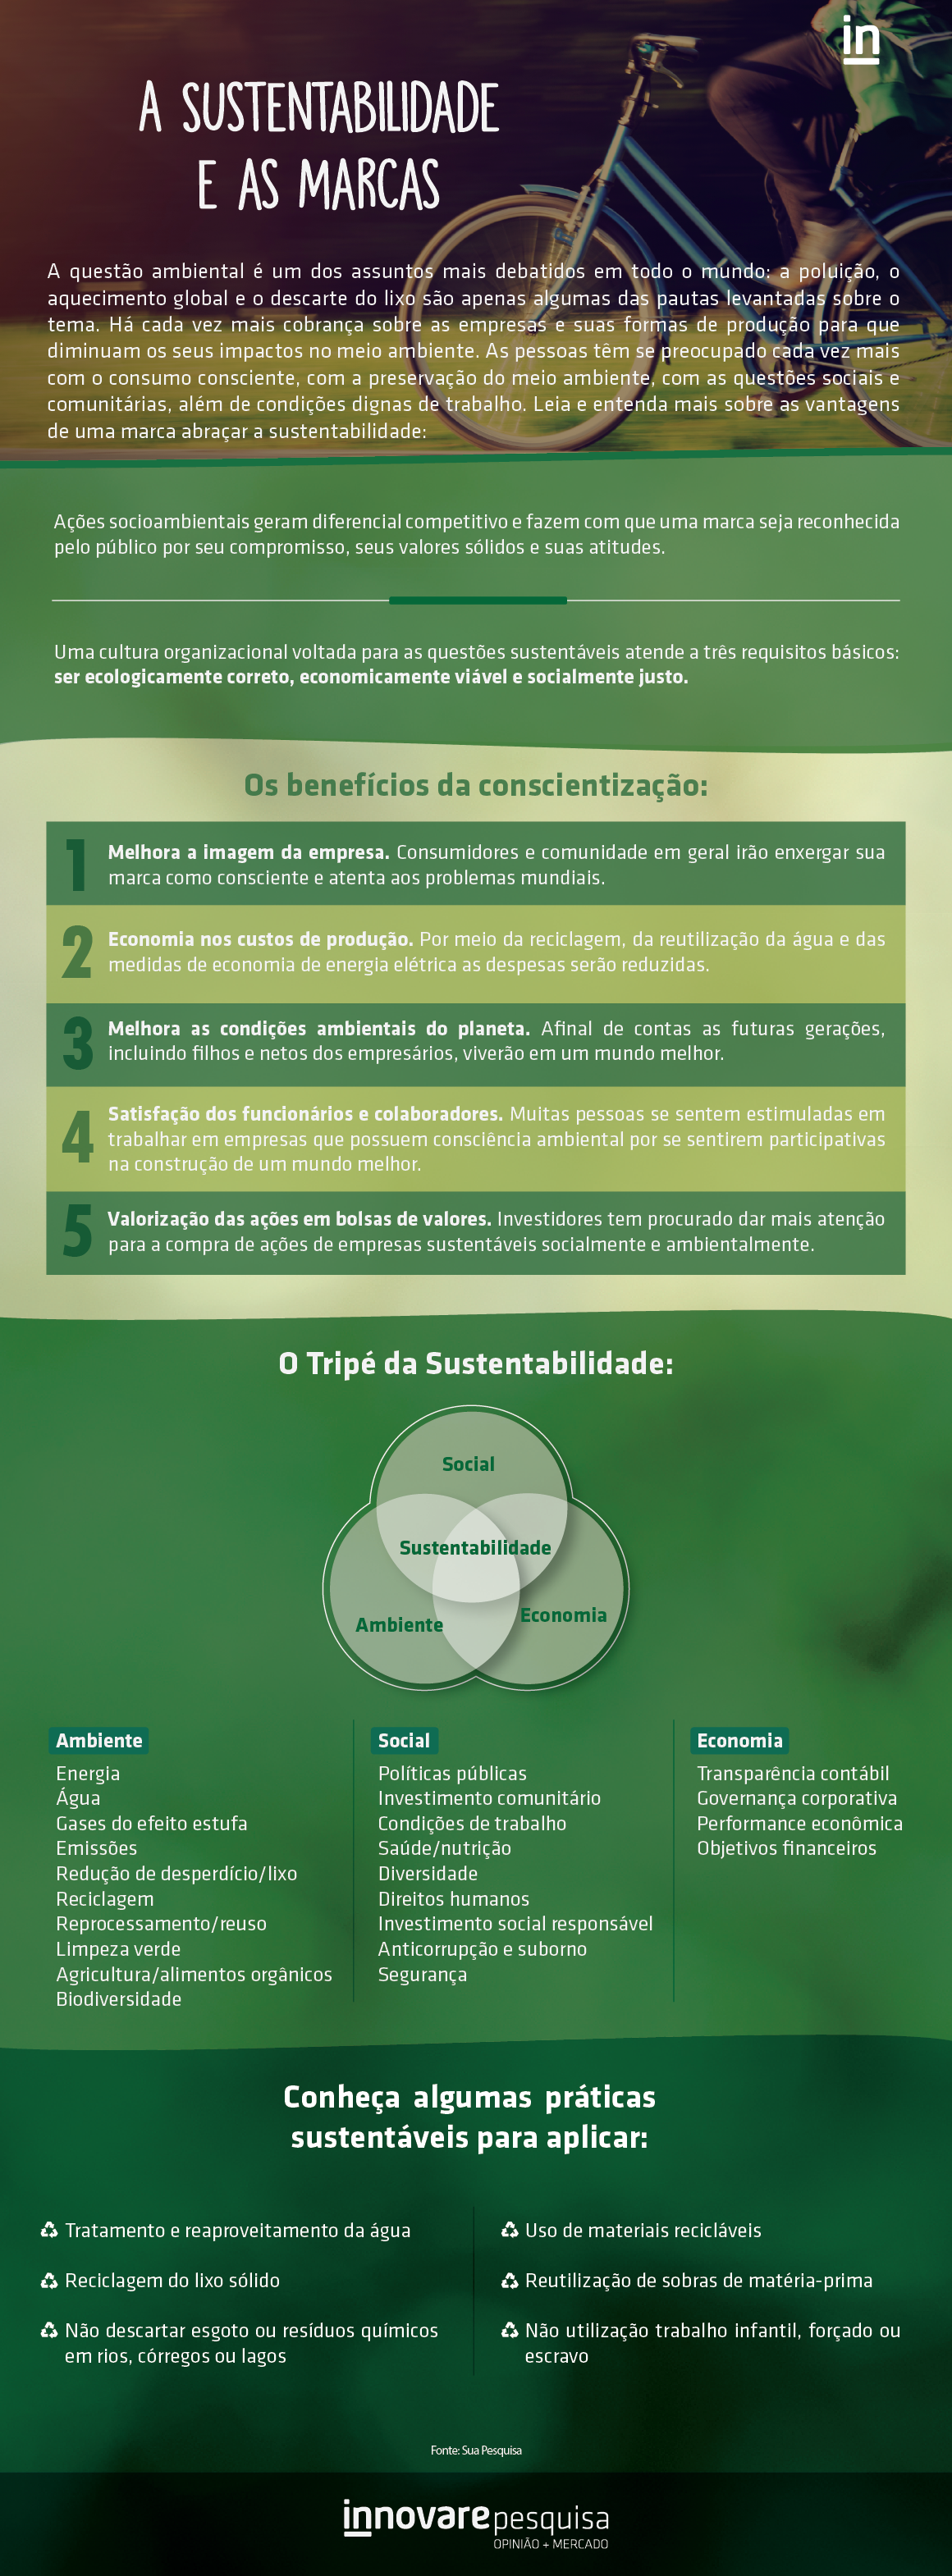 A-Sustentabilidade-e-as-Marcas